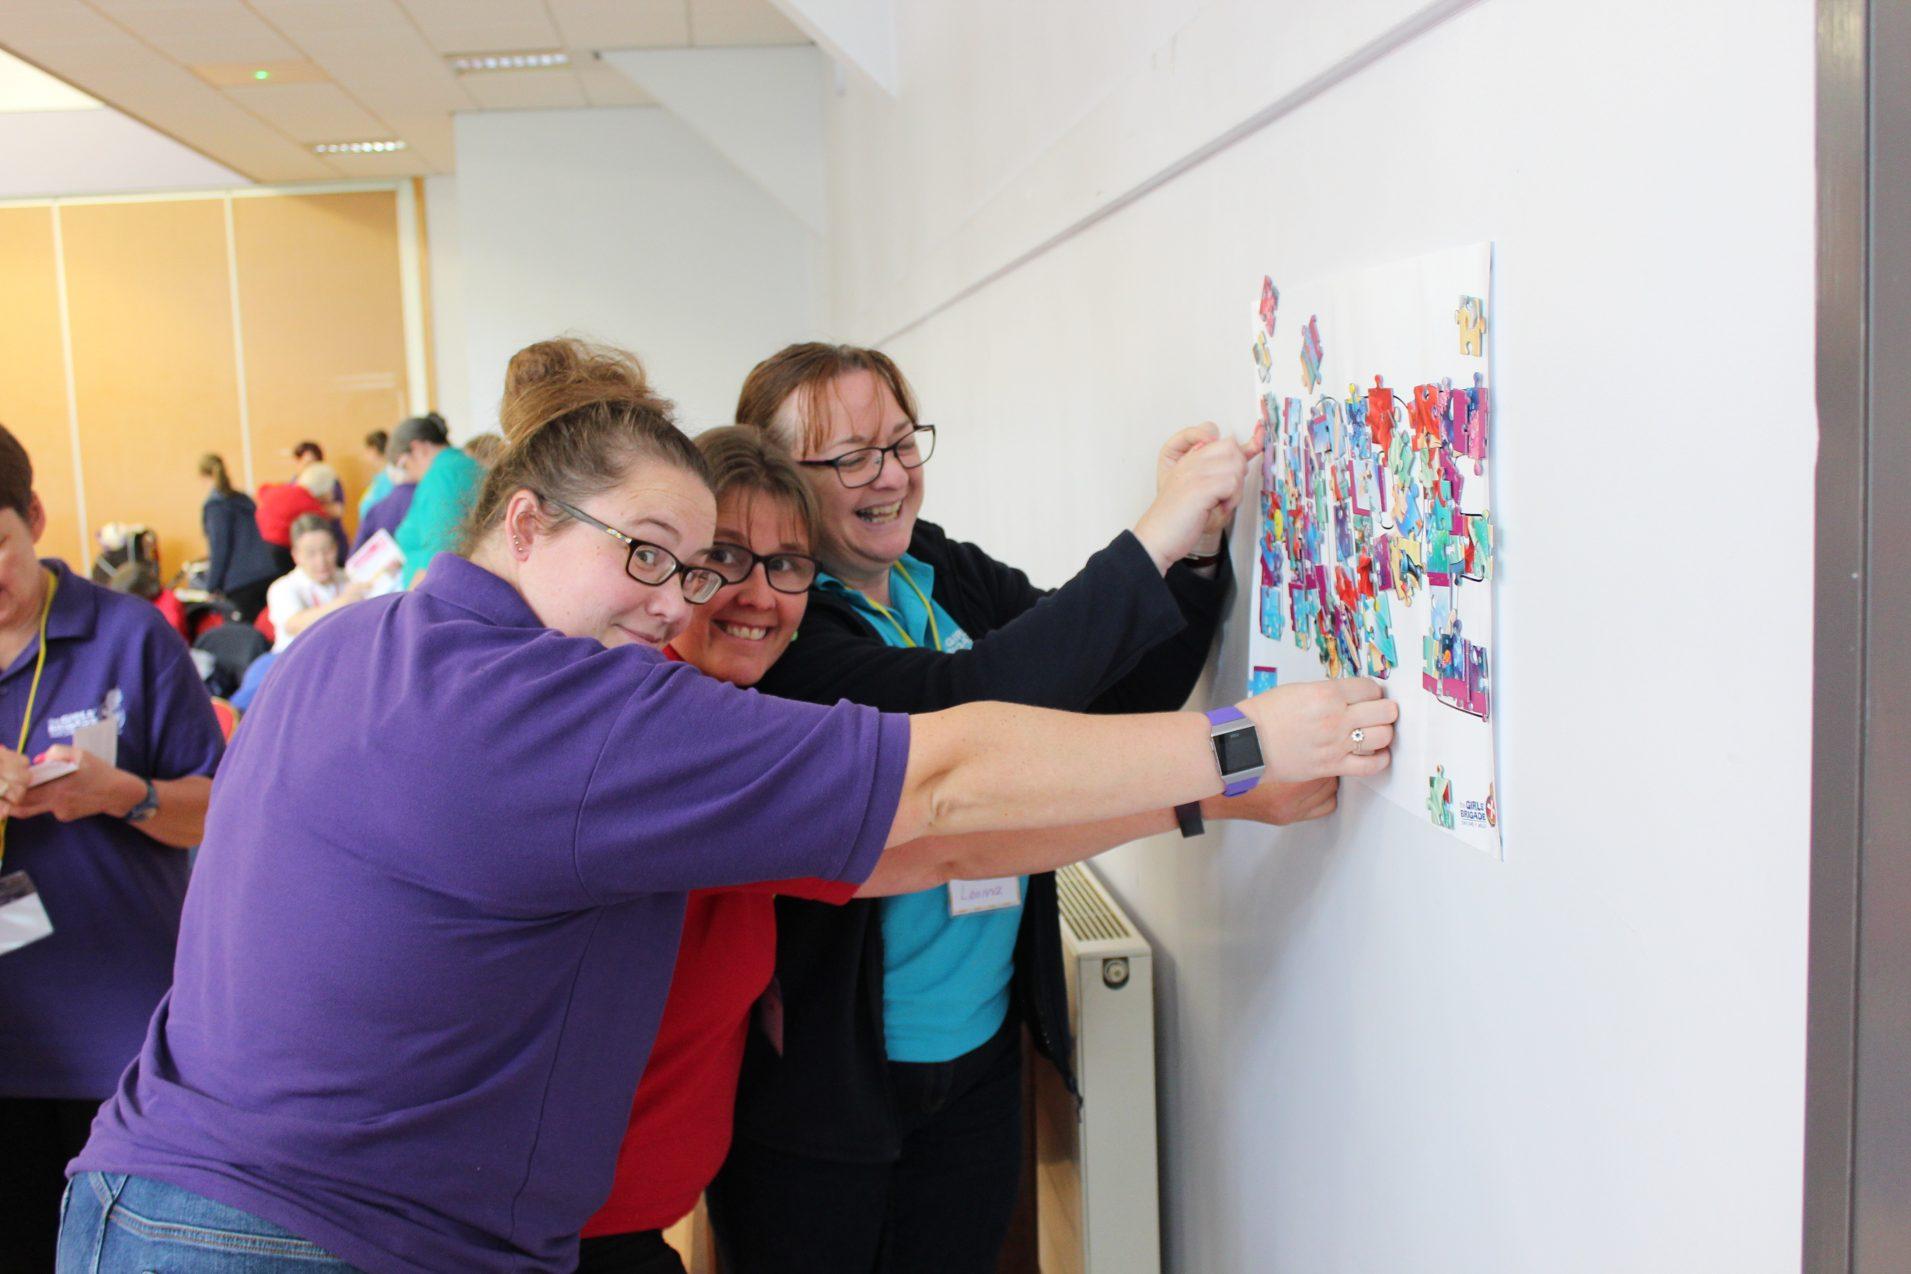 Girls' Brigade volunteers sticking jigsaw pieces to display